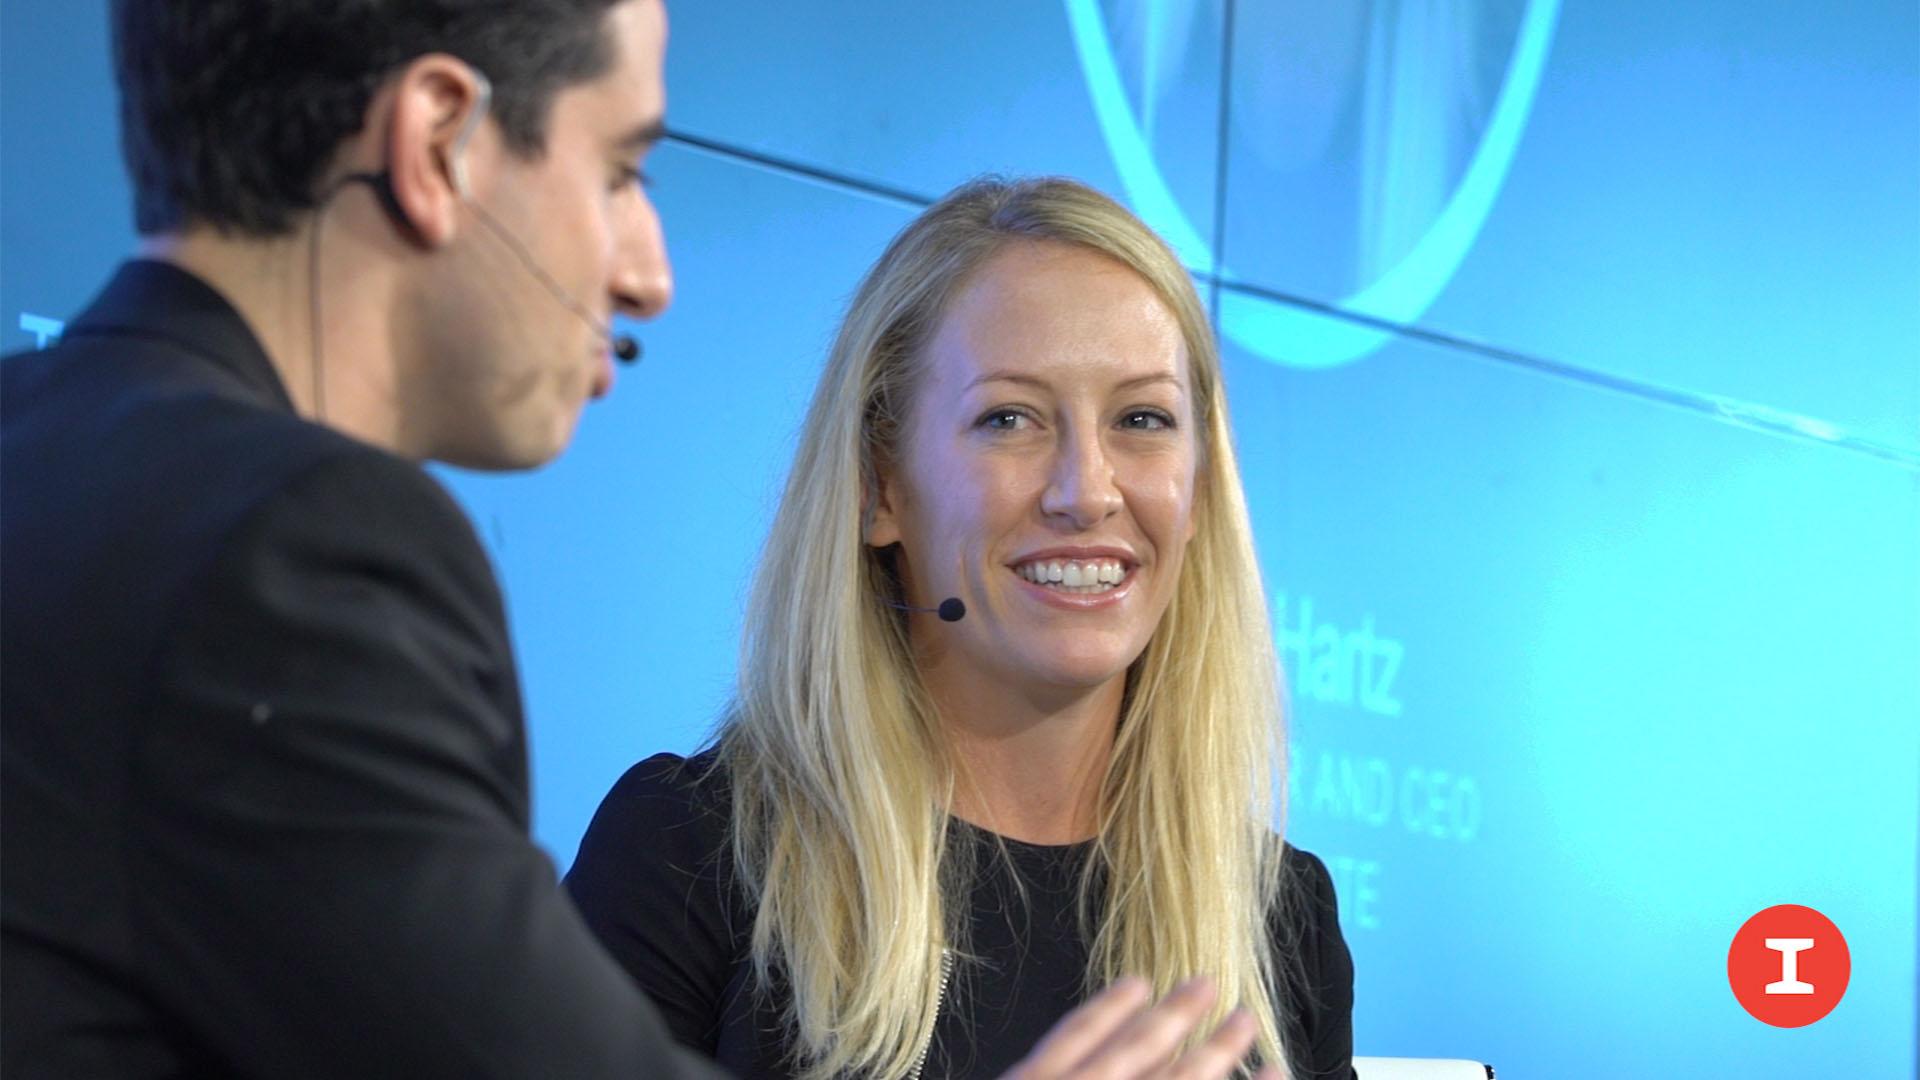 Eventbrite CEO Julia Hartz on Growing the Business